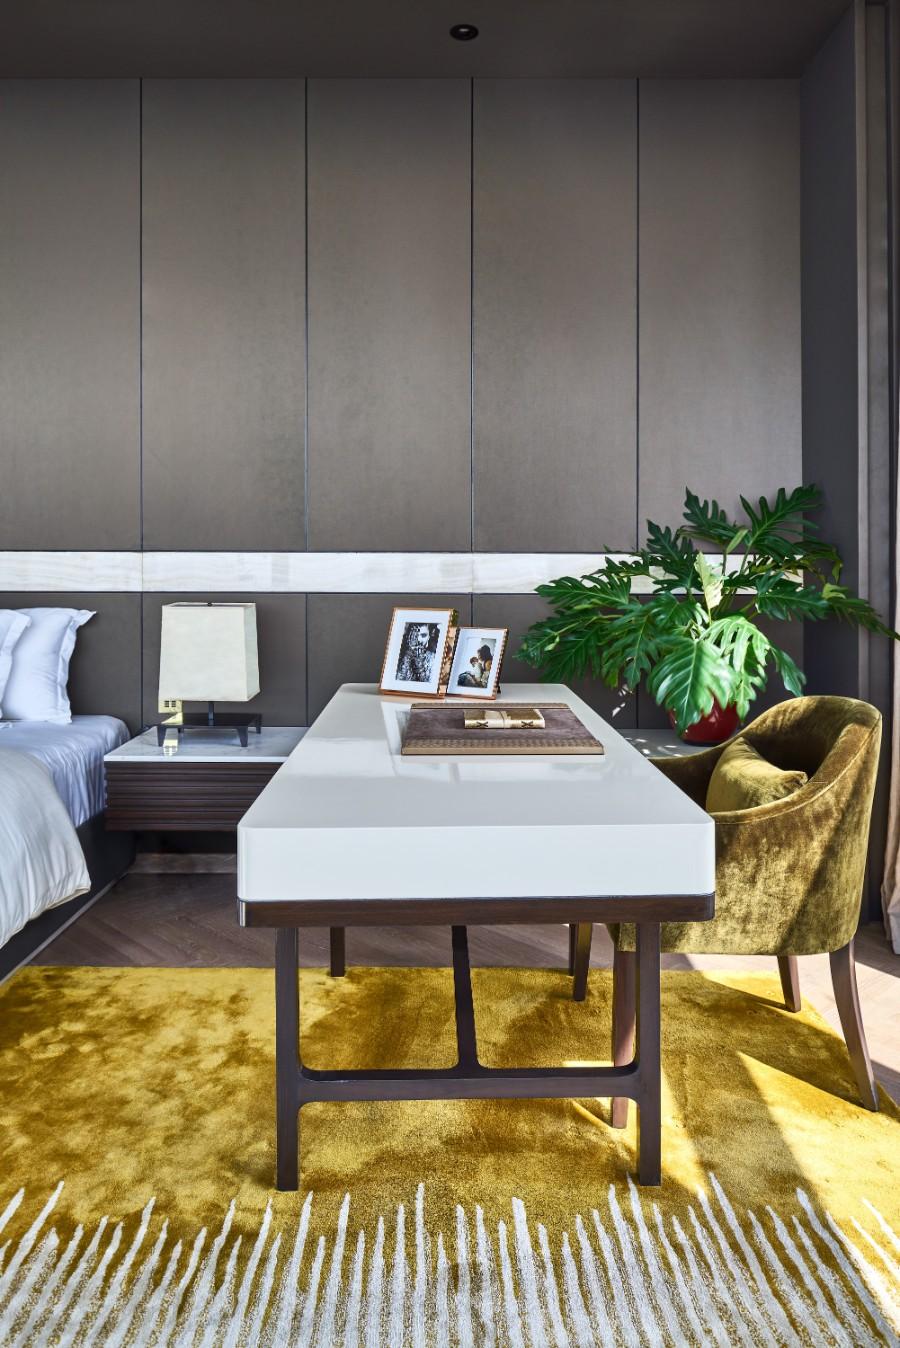 exclusive design Exclusive Design: Altamount Residence by Hirsch Bedner Associates Inside Altamount Residence by Hirsch Bedner Associates 13